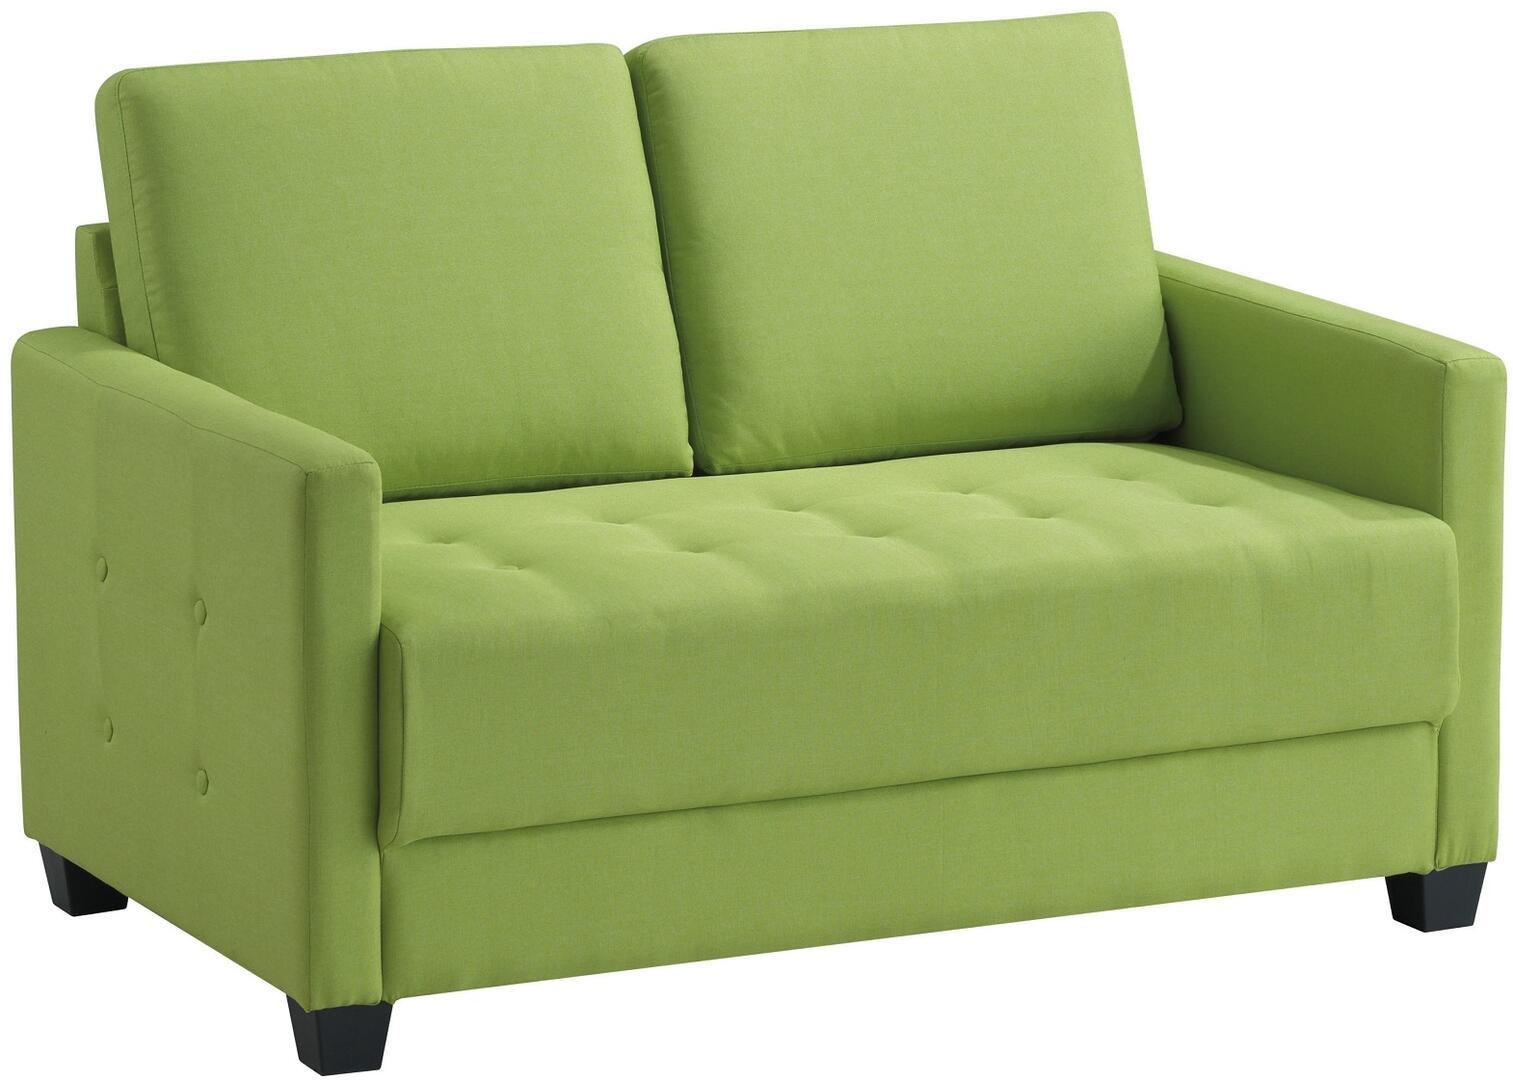 Glory furniture g771set living room sets appliances for Furniture connection